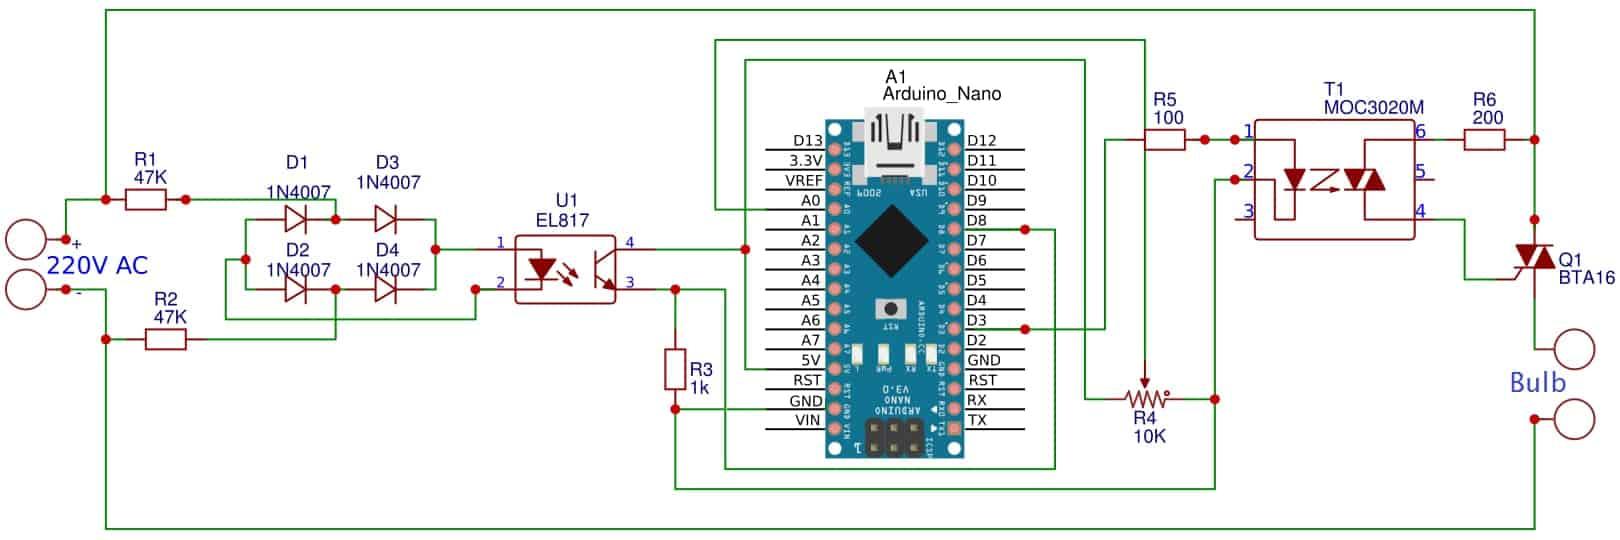 220V AC Light/Fan Dimmer using TRIAC & Arduino